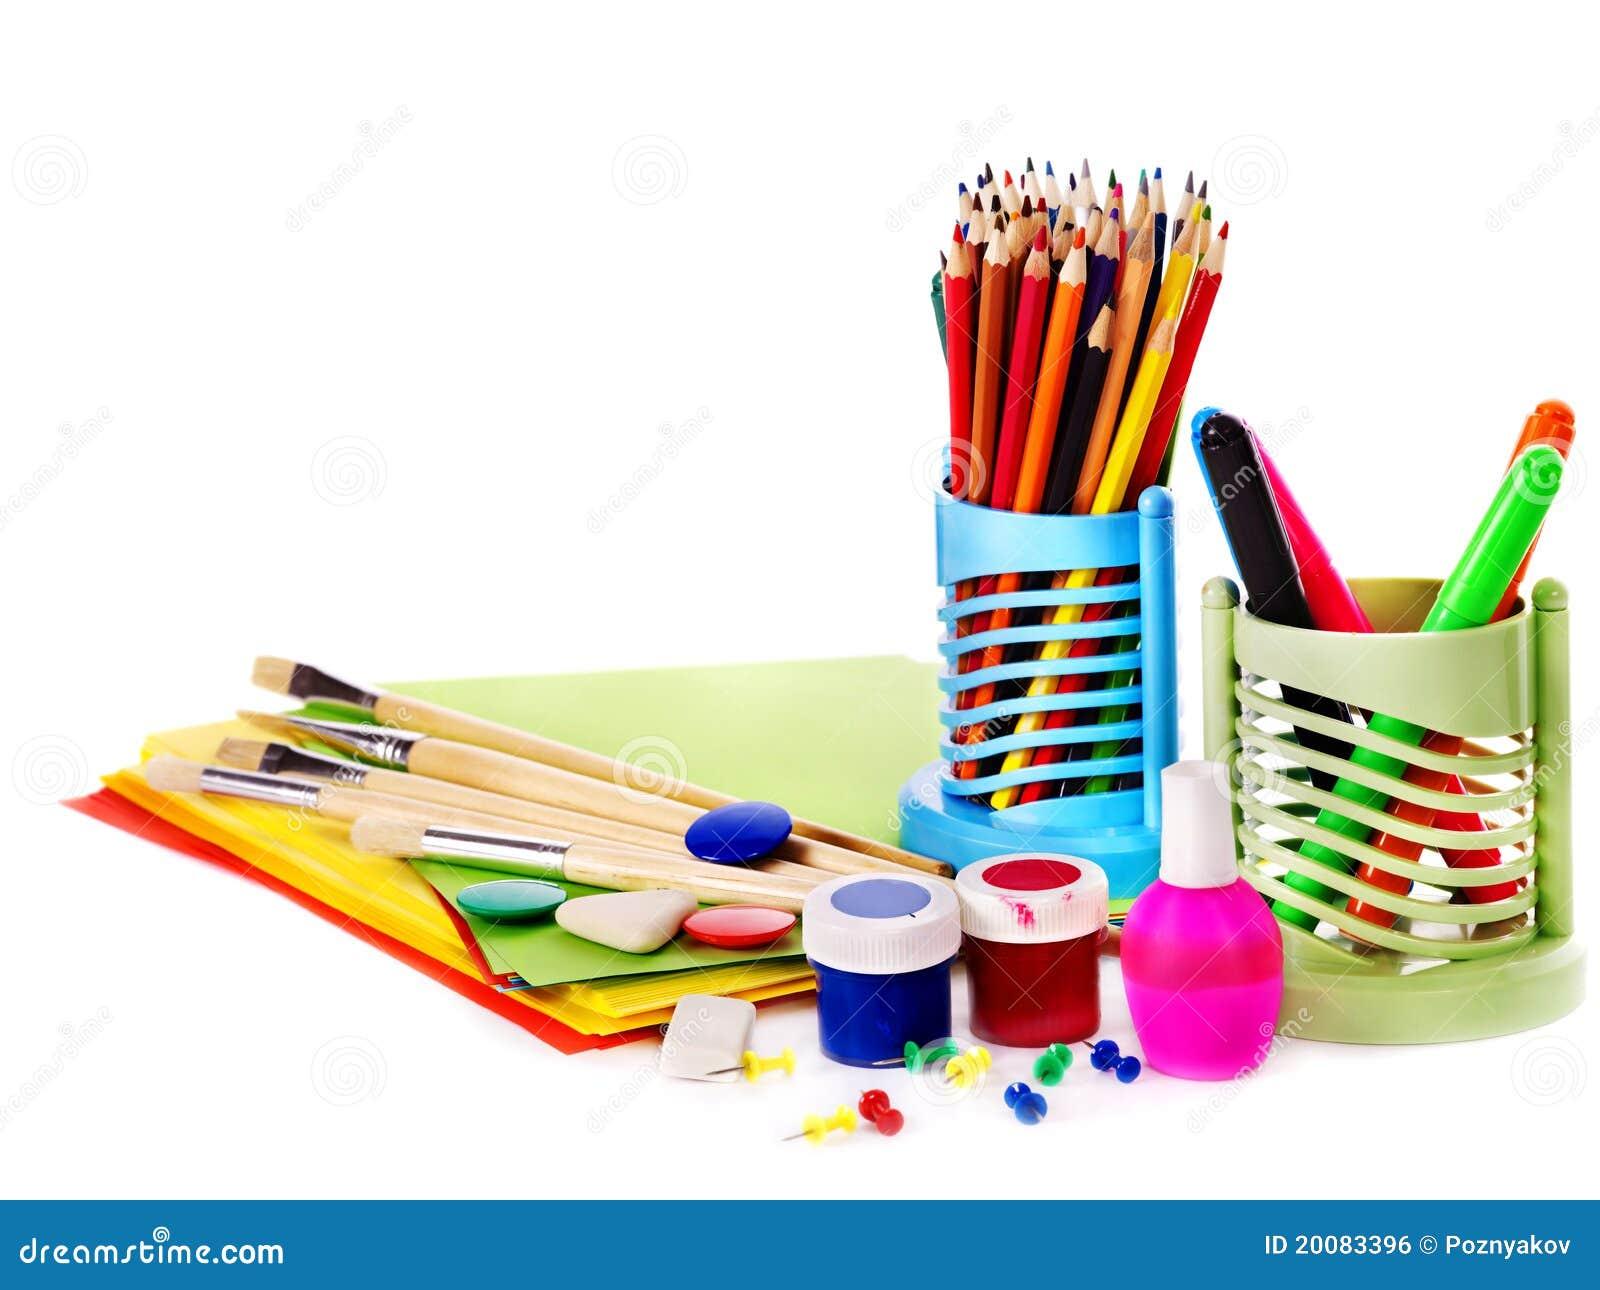 School art supplies stock photo. Image of brush, craft ...